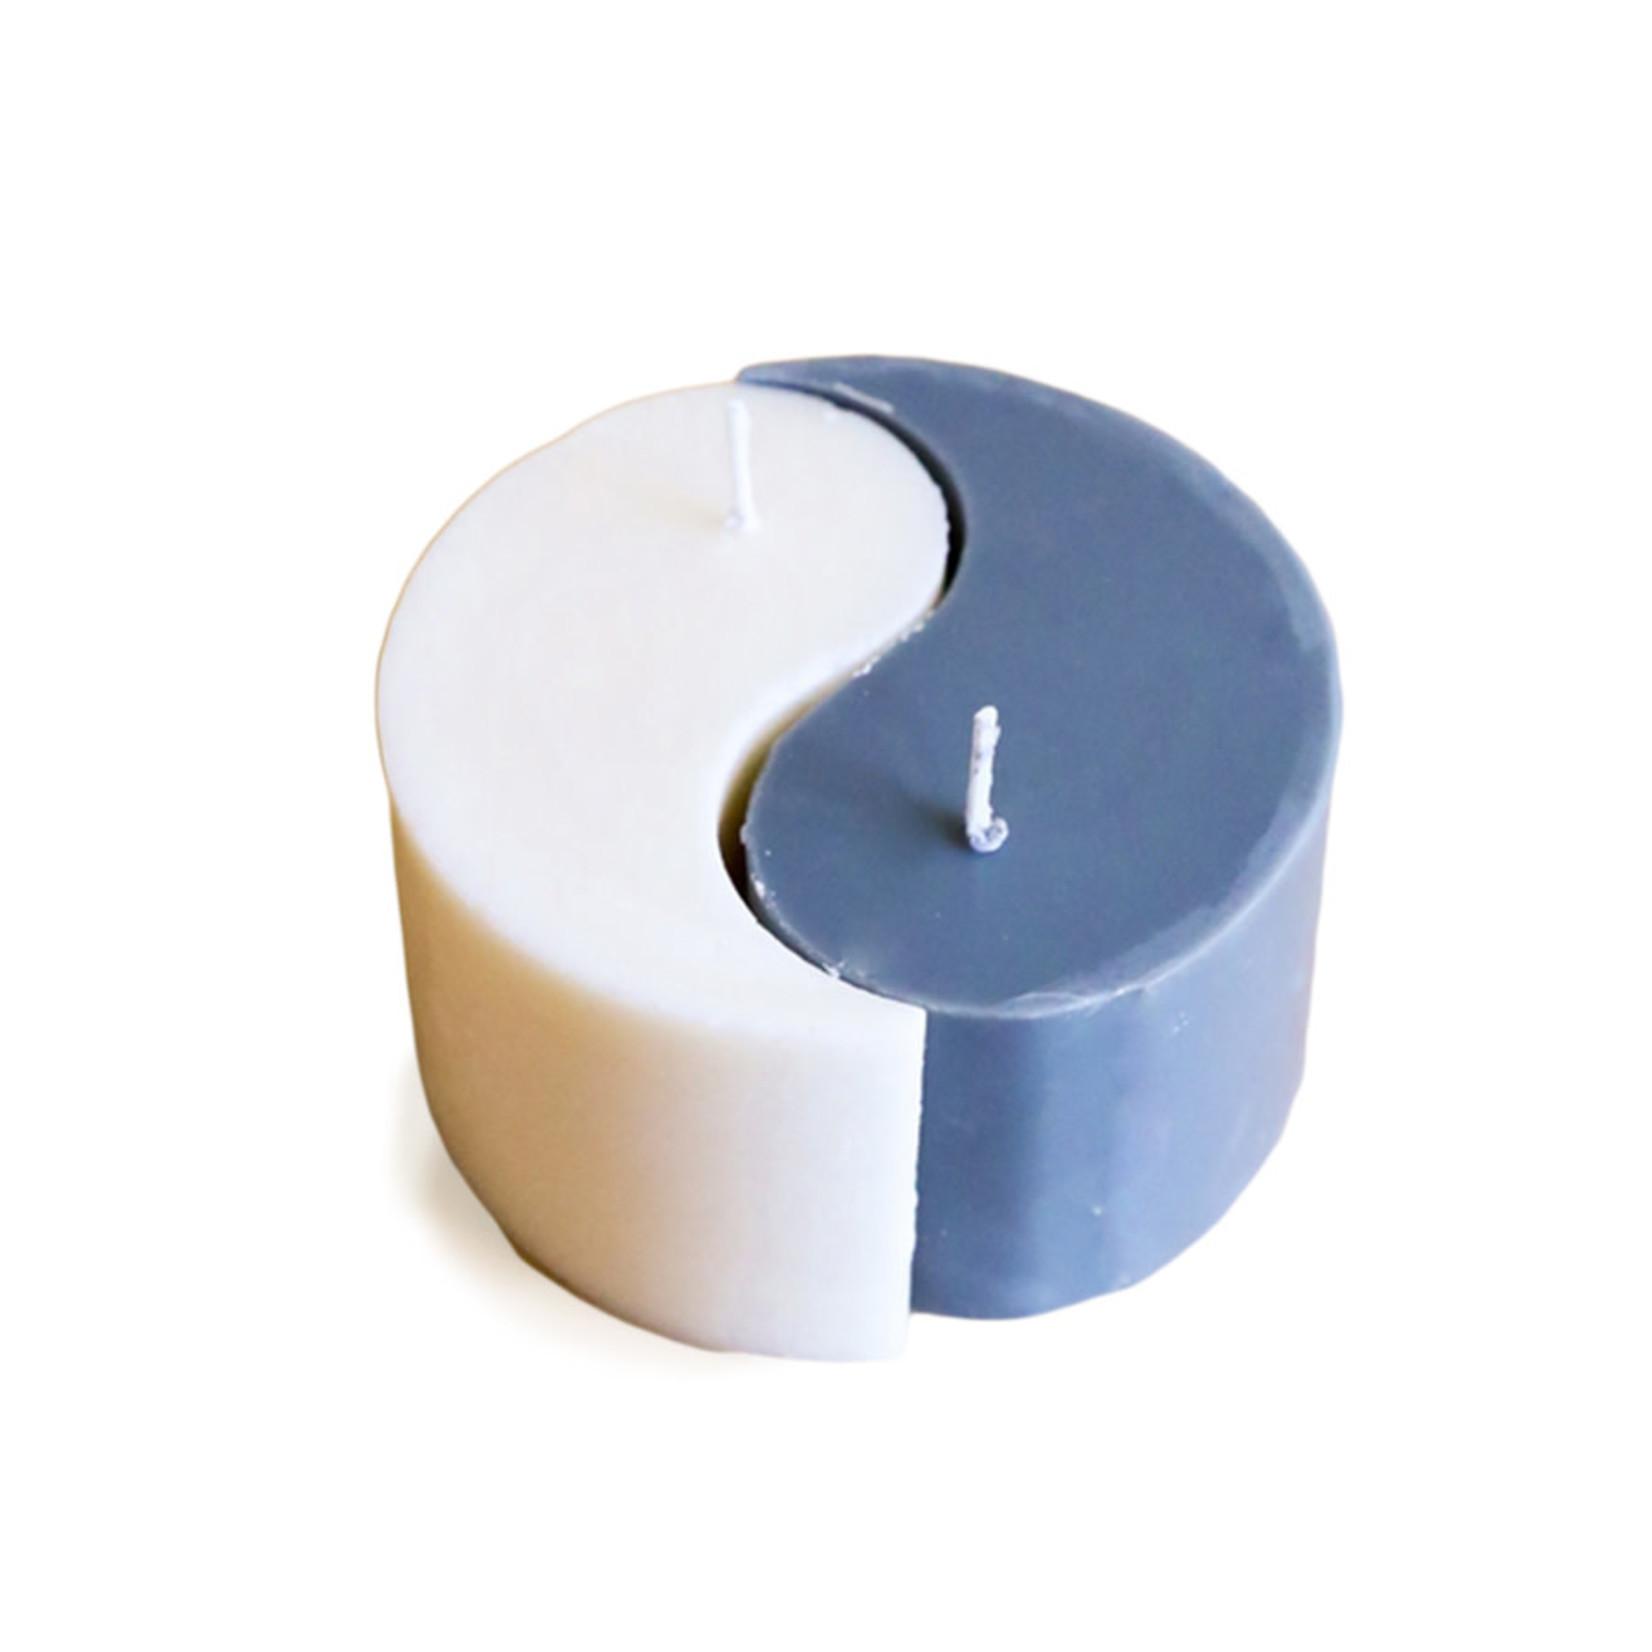 JaxKelly Yin Yang Molded Candle